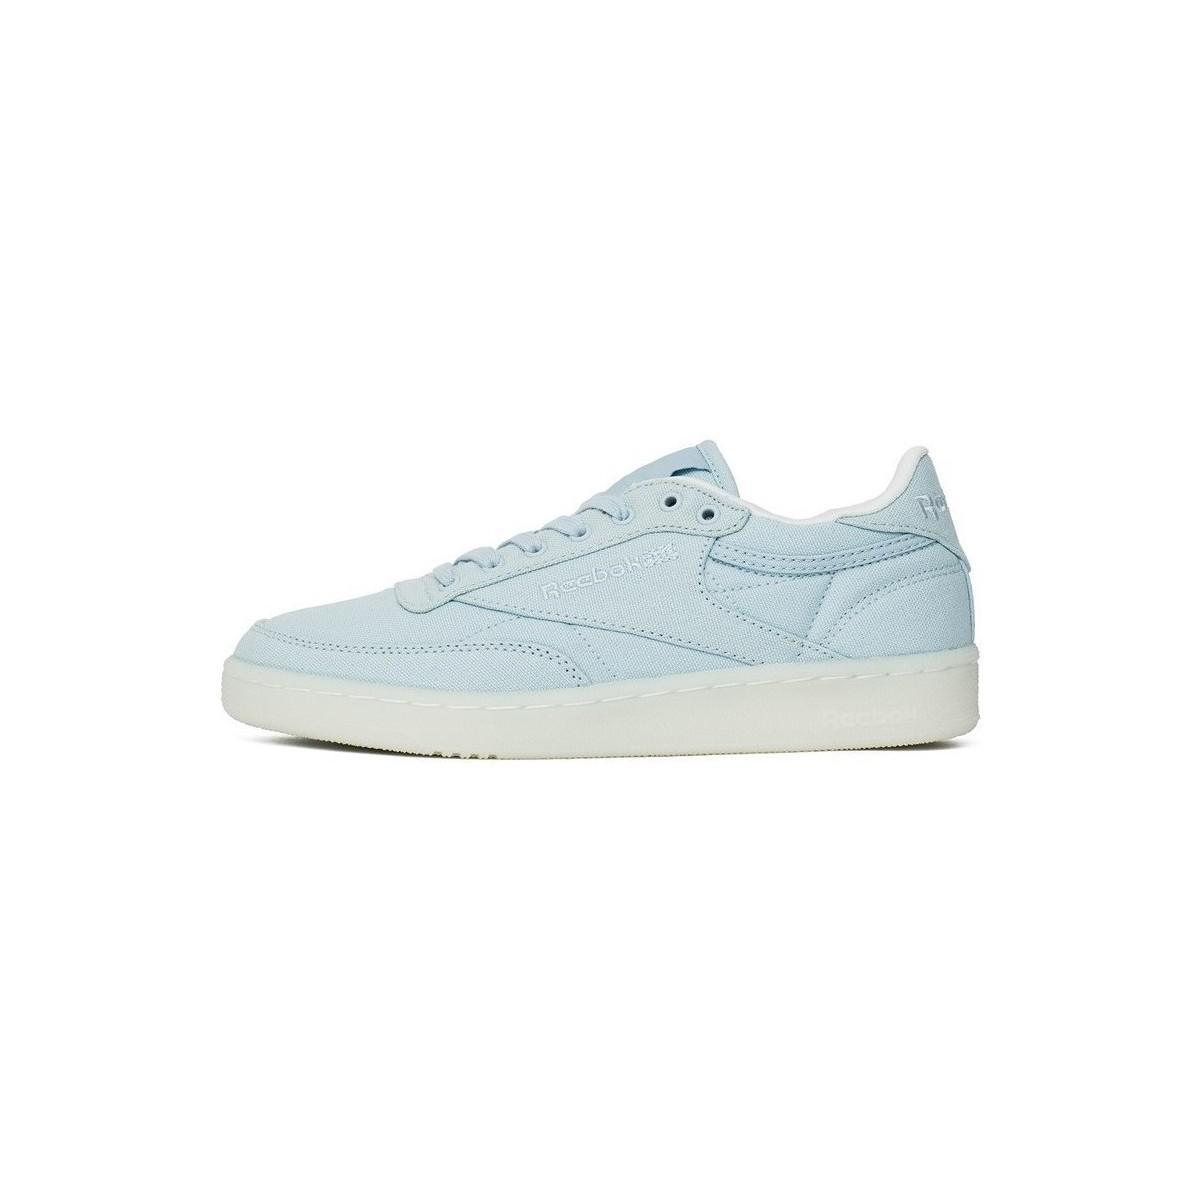 de5cb609d00a6 Reebok Club C 85 Canvas Zee Blue Women s Shoes (trainers) In White ...